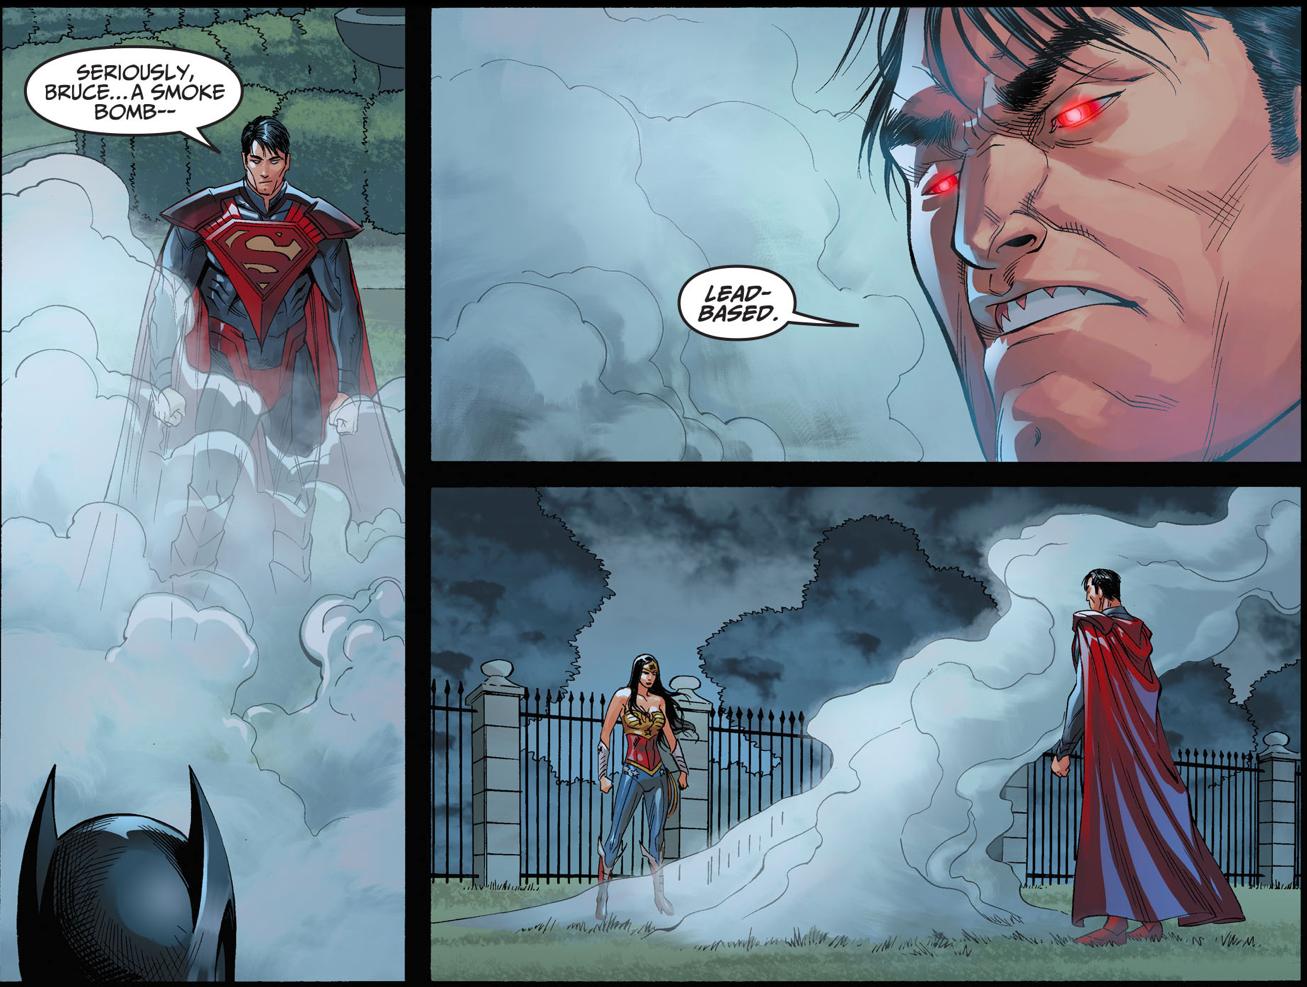 batman vs superman (injustice gods among us)